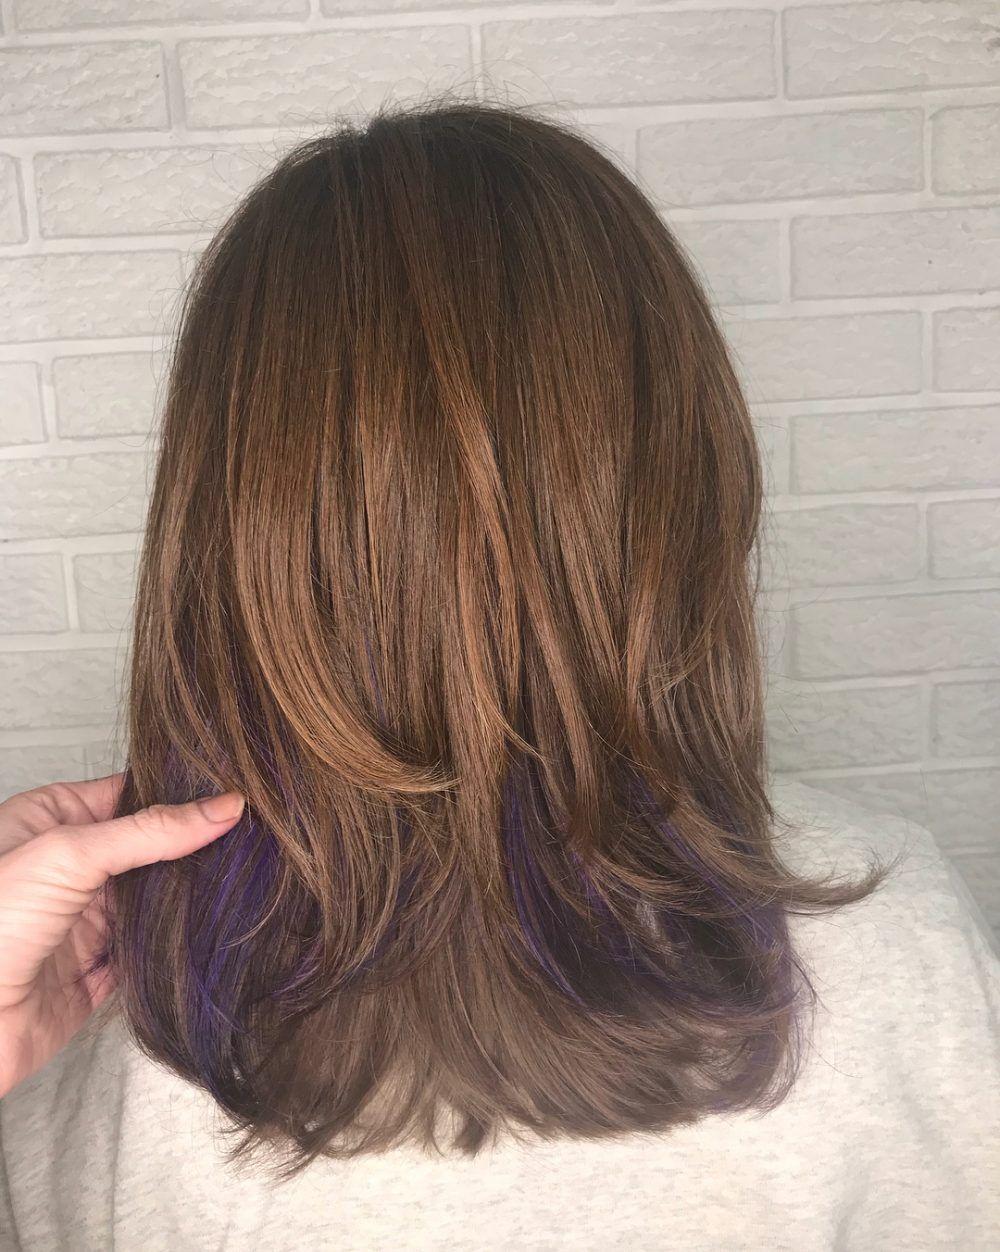 Purple Peekaboos Hairstyle Peekaboo Hair Peekaboo Highlights Chocolate Brown Hair